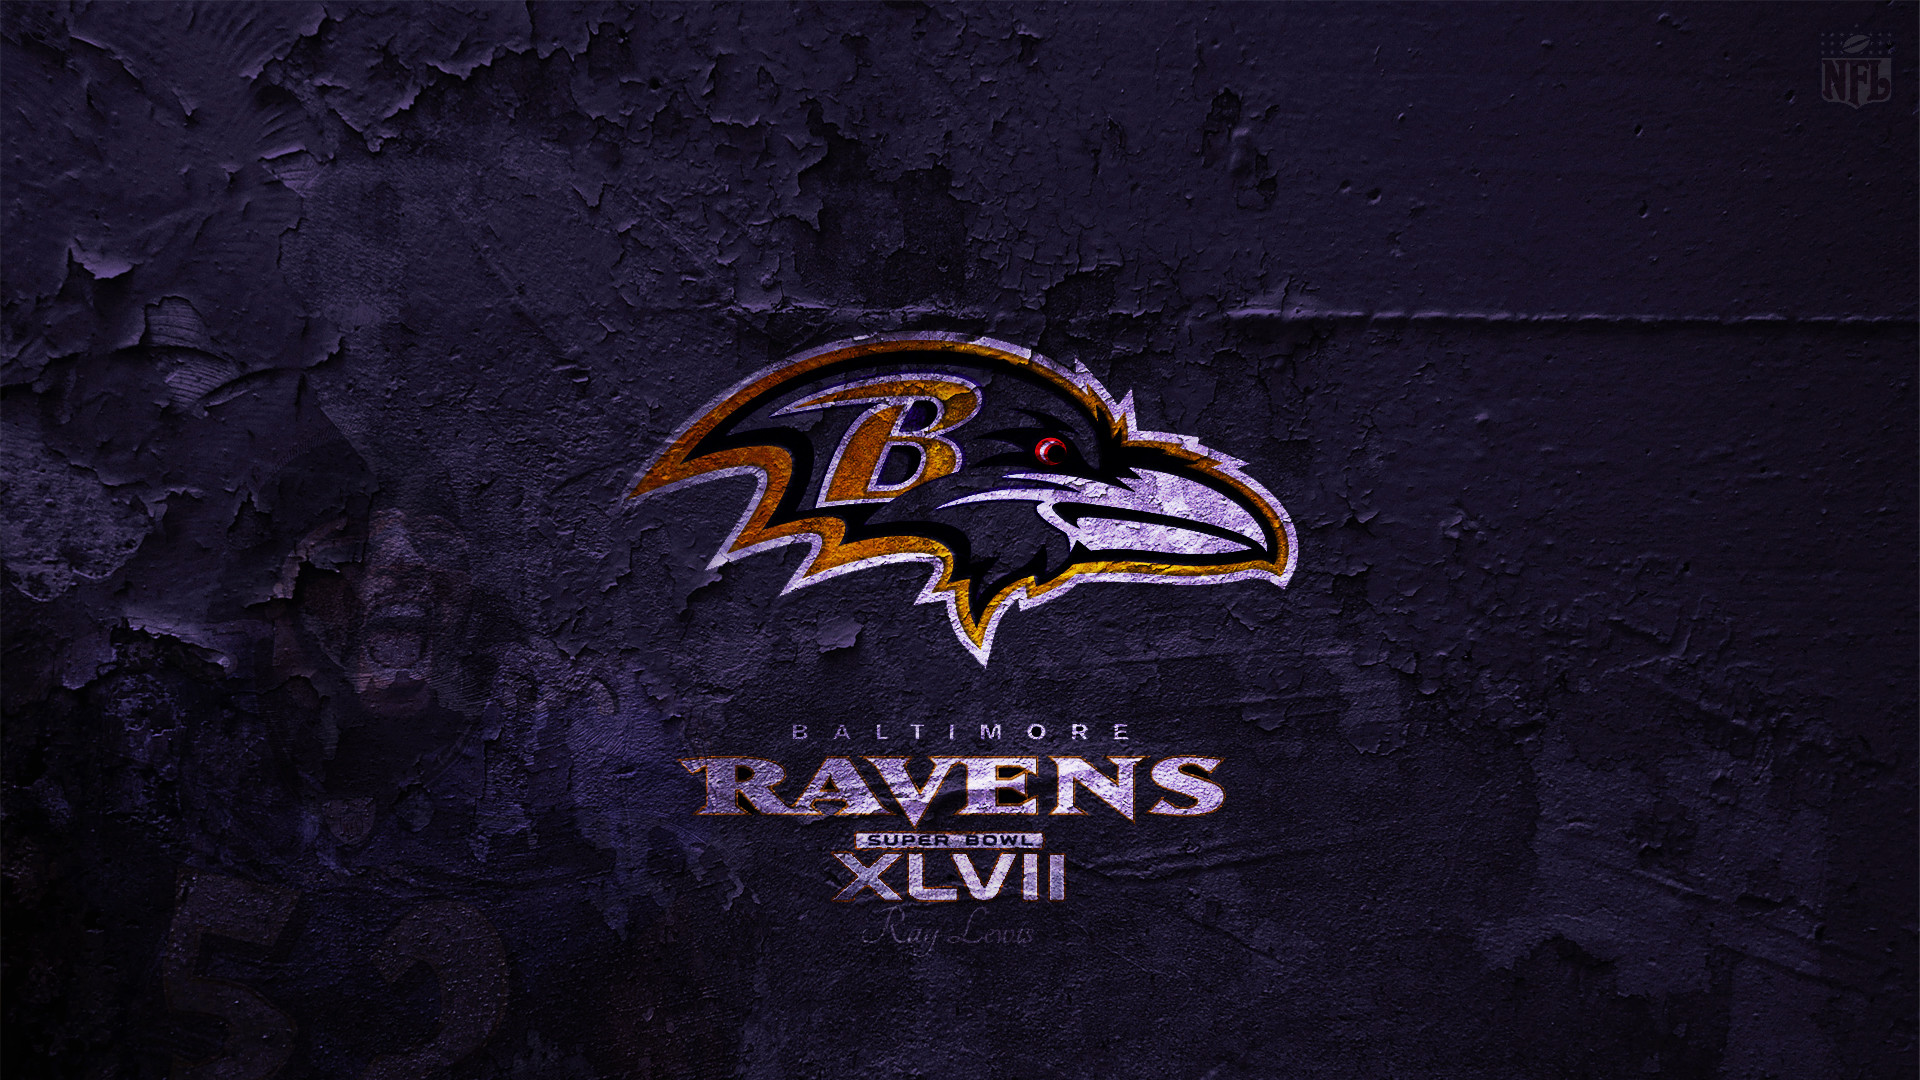 ravens wallpaper | Beautiful Wallpapers | Pinterest | Ravens and Wallpaper